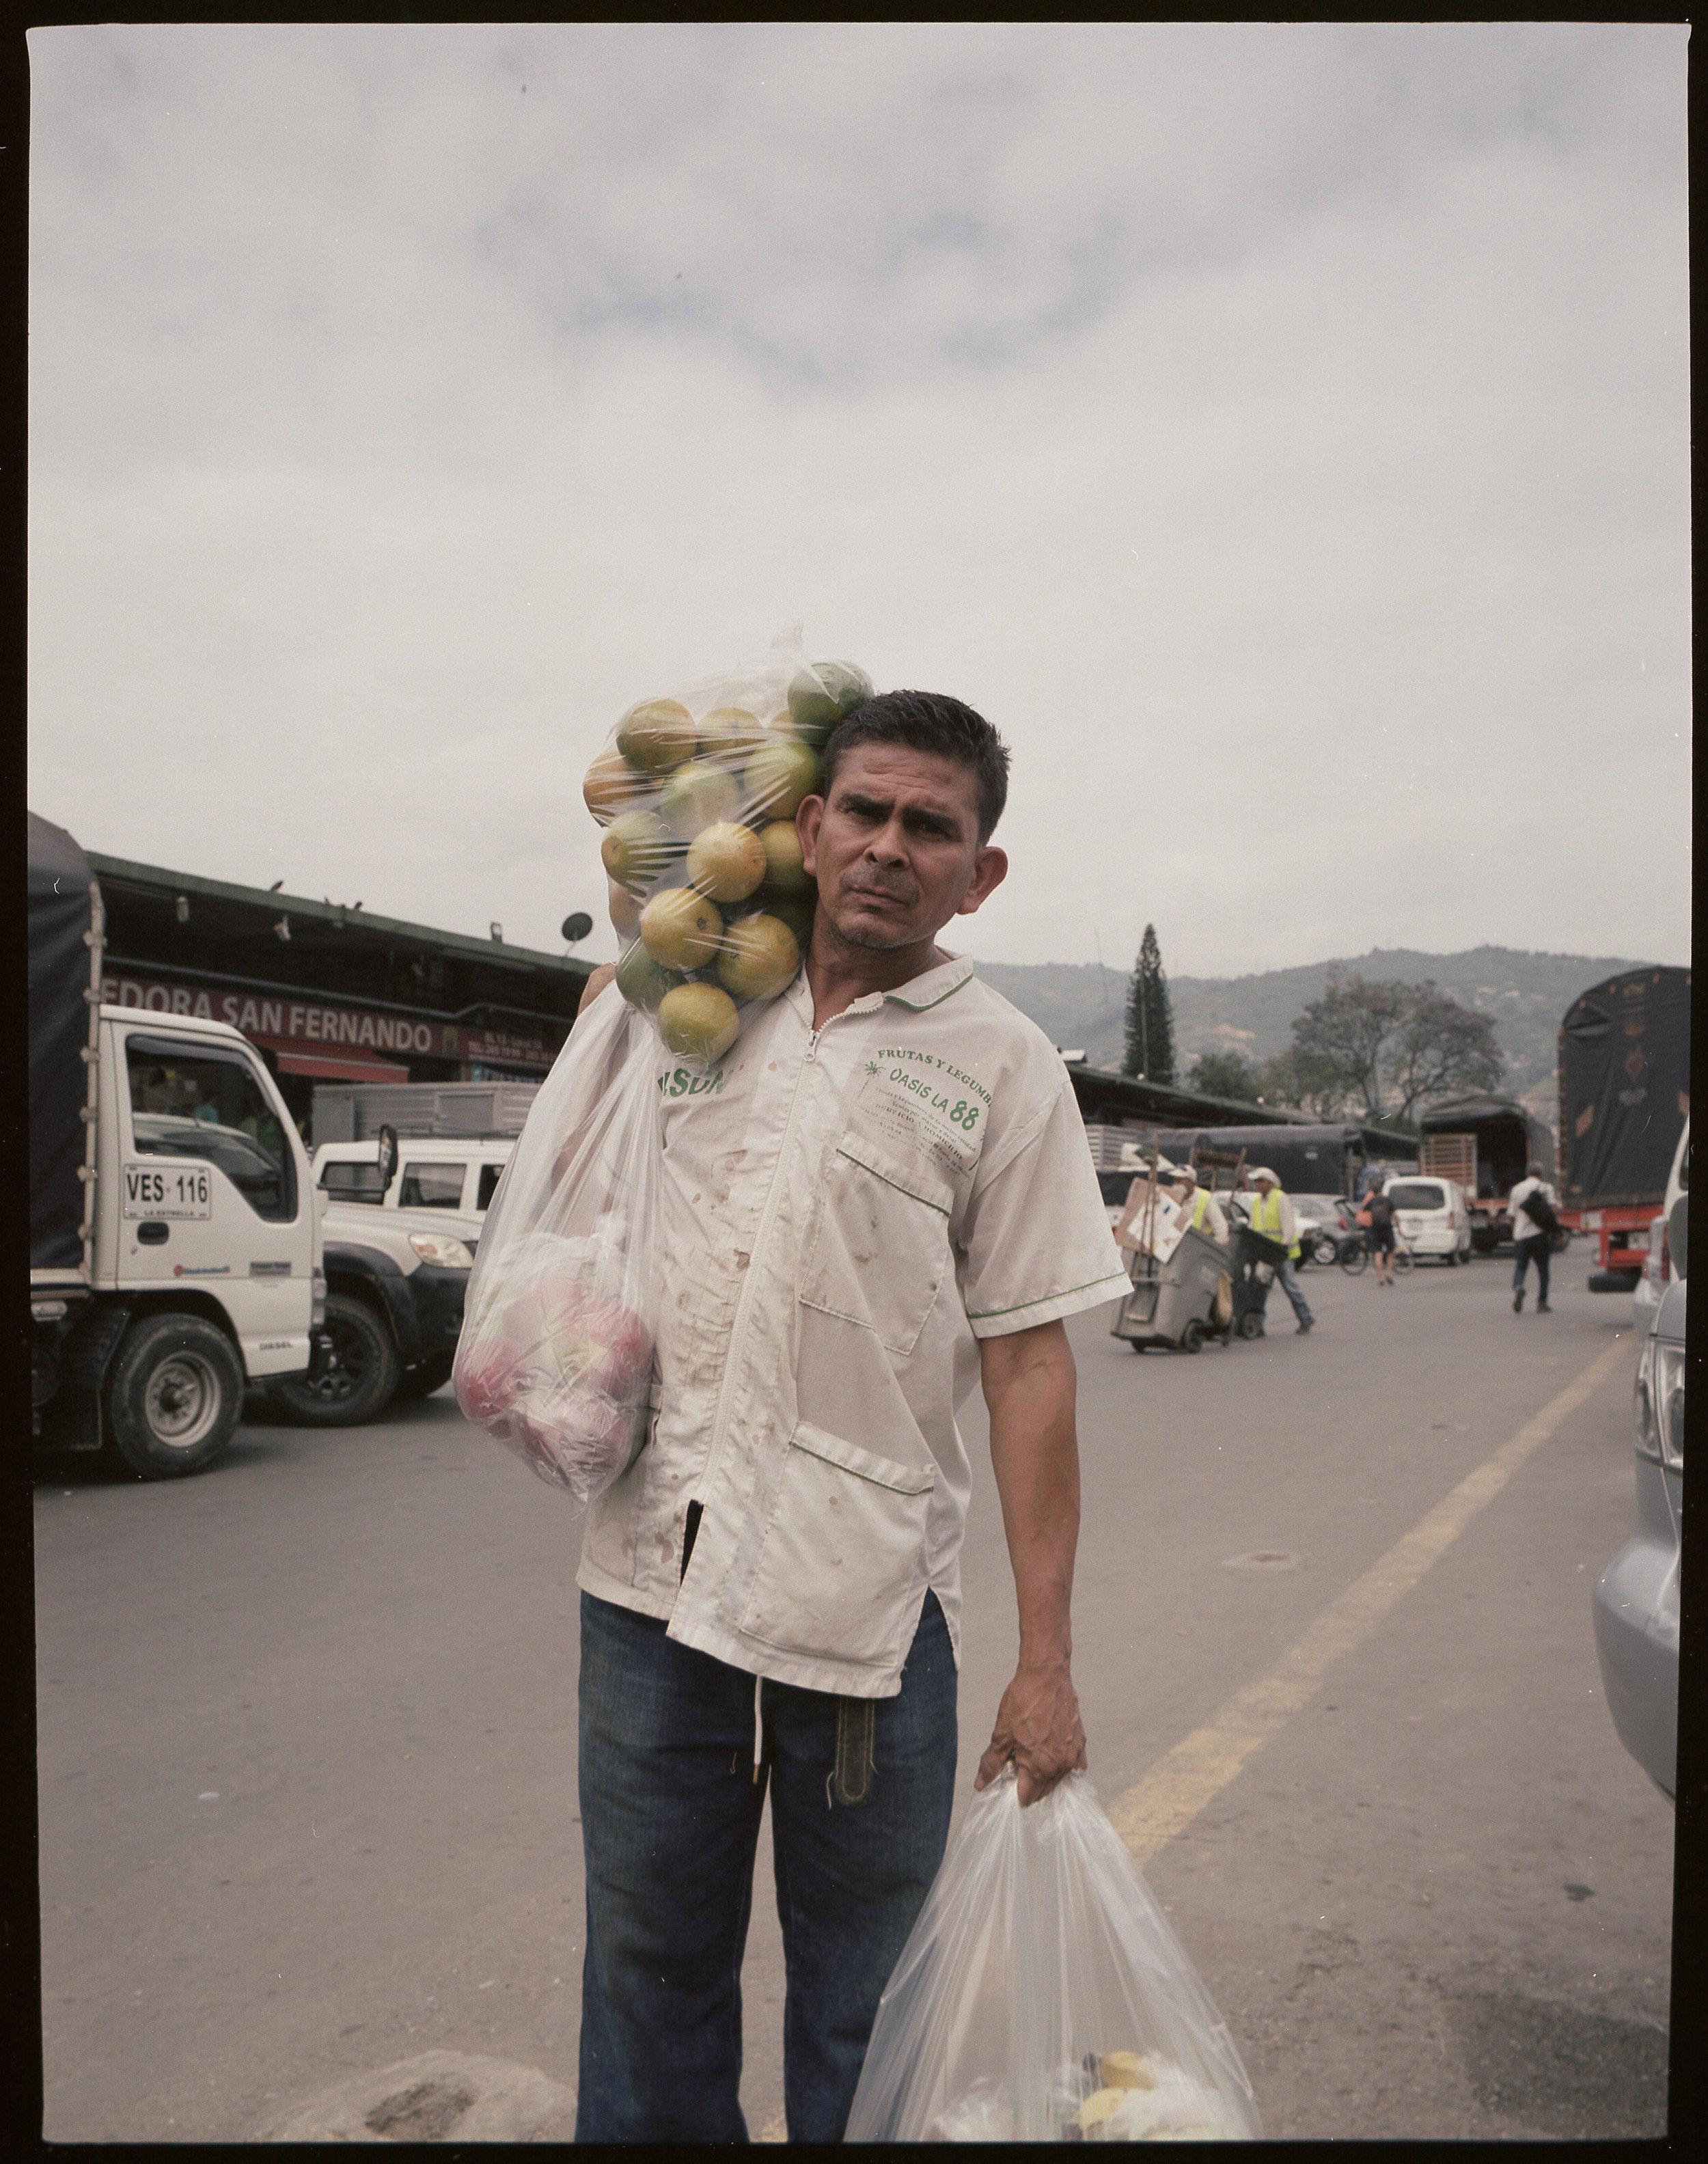 Medellin020.jpg